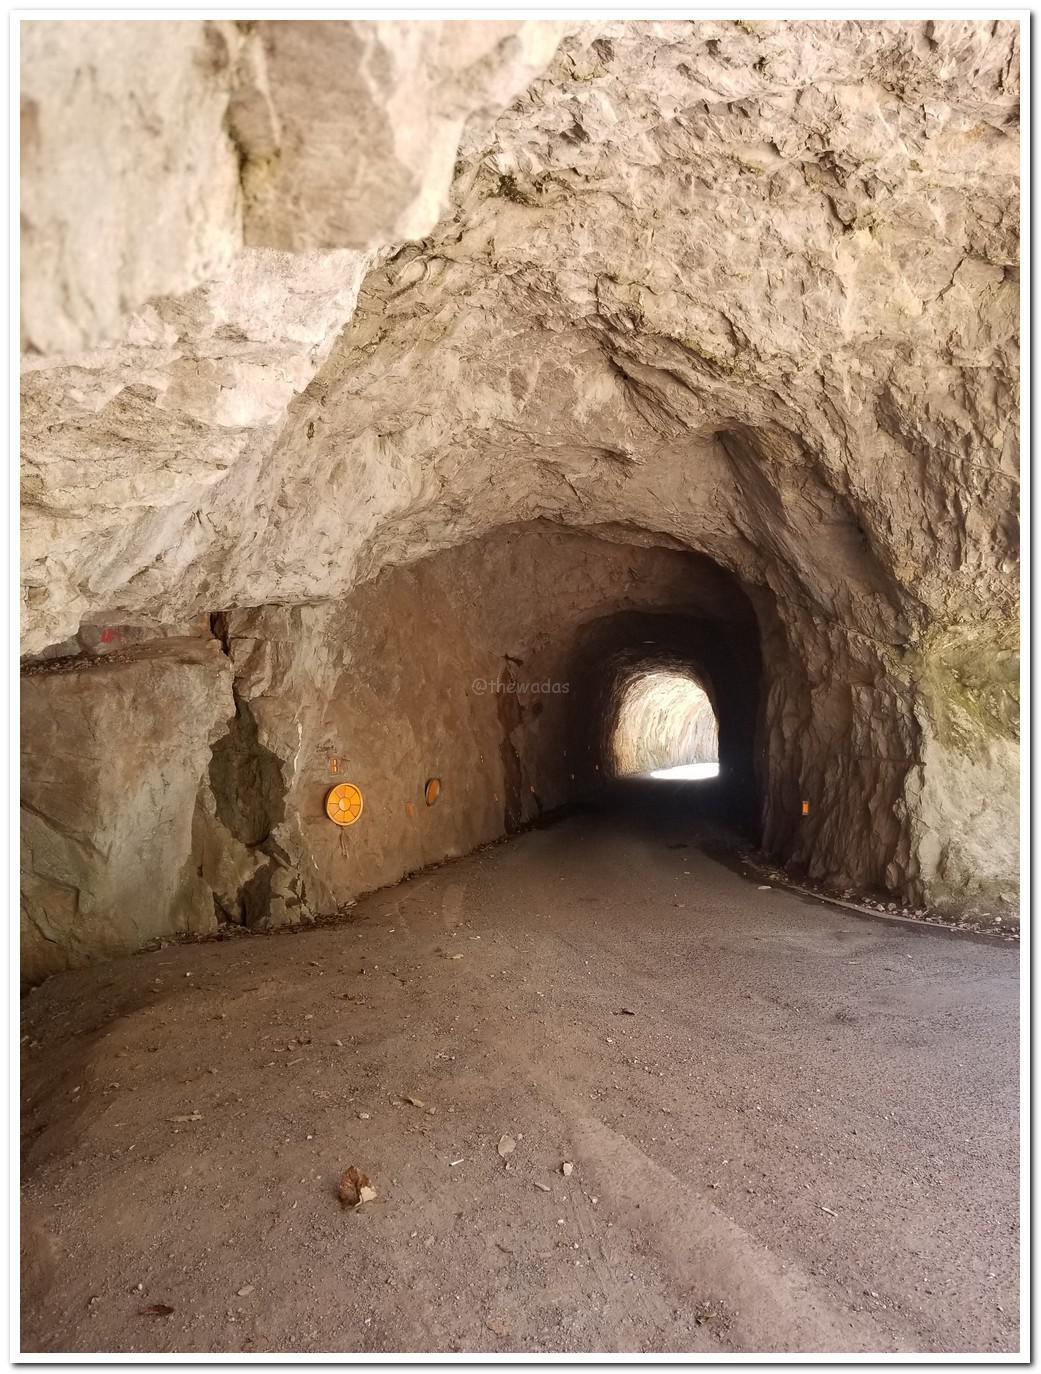 Hayama Tunnel in Takahashi City